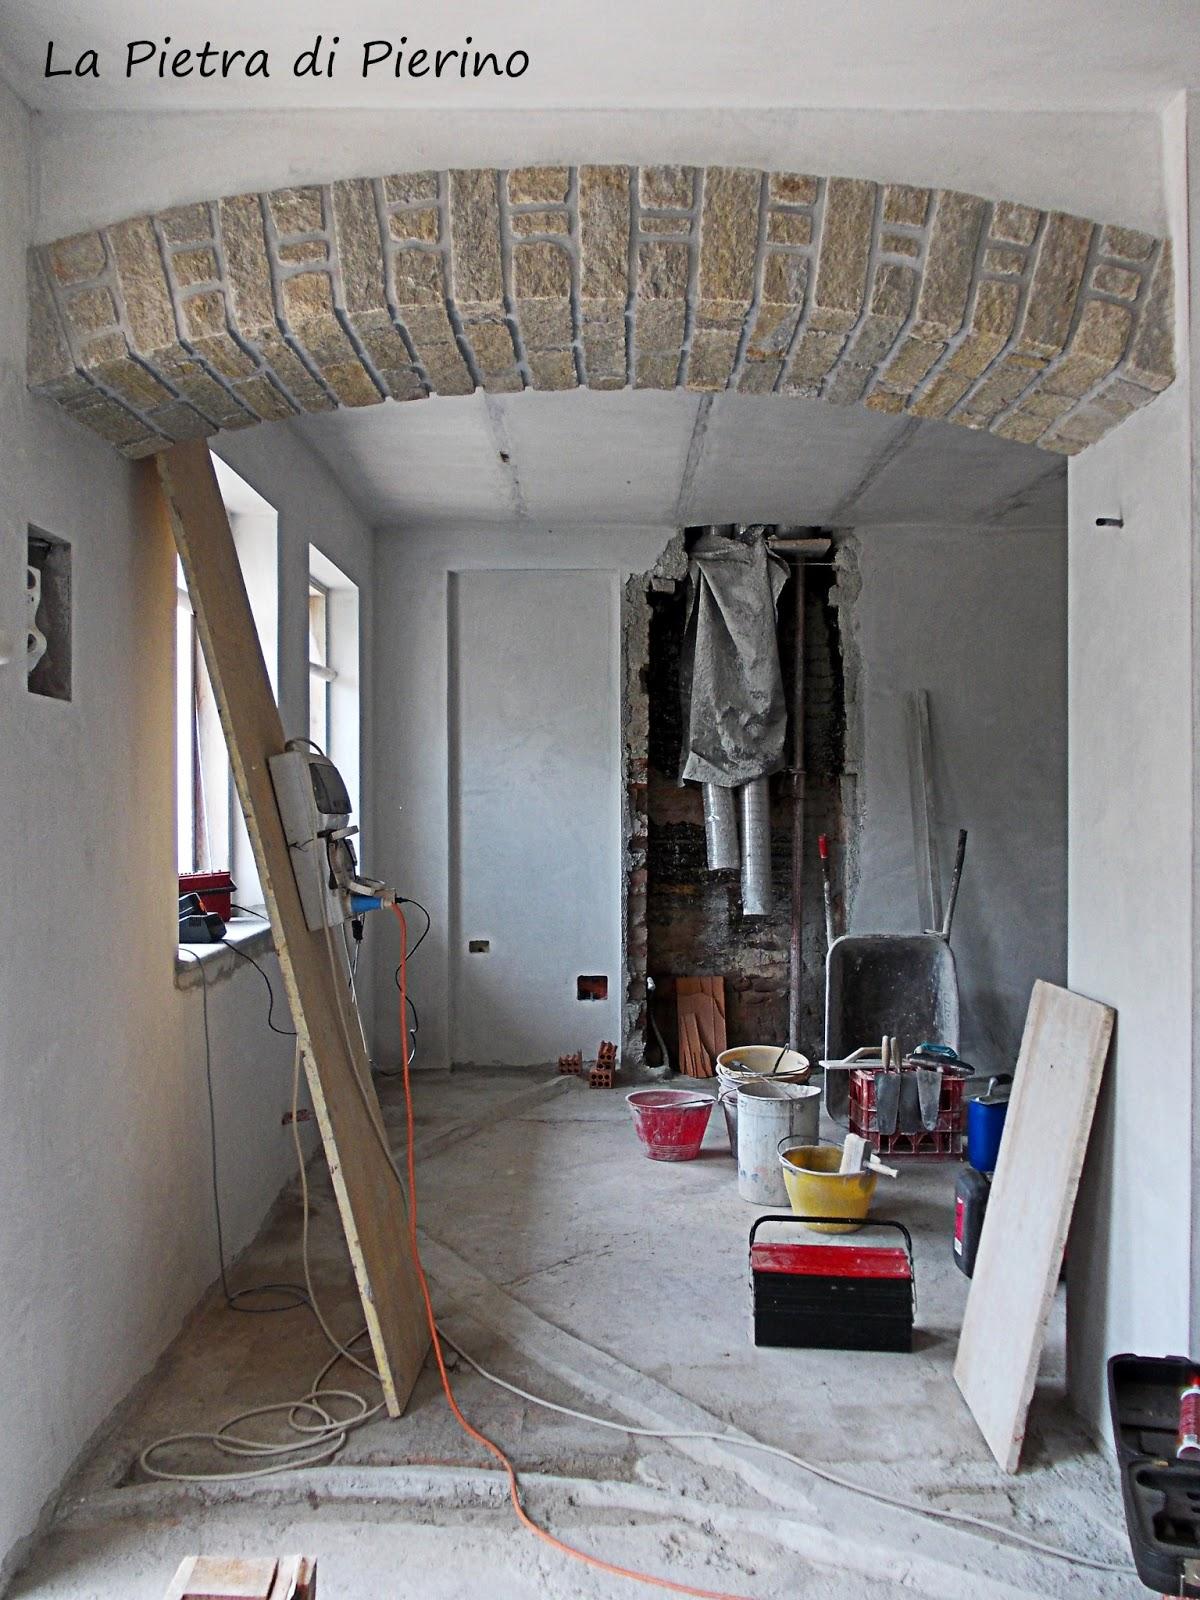 Archi in pietra per interni kp43 regardsdefemmes - Decorazioni in pietra per interni ...